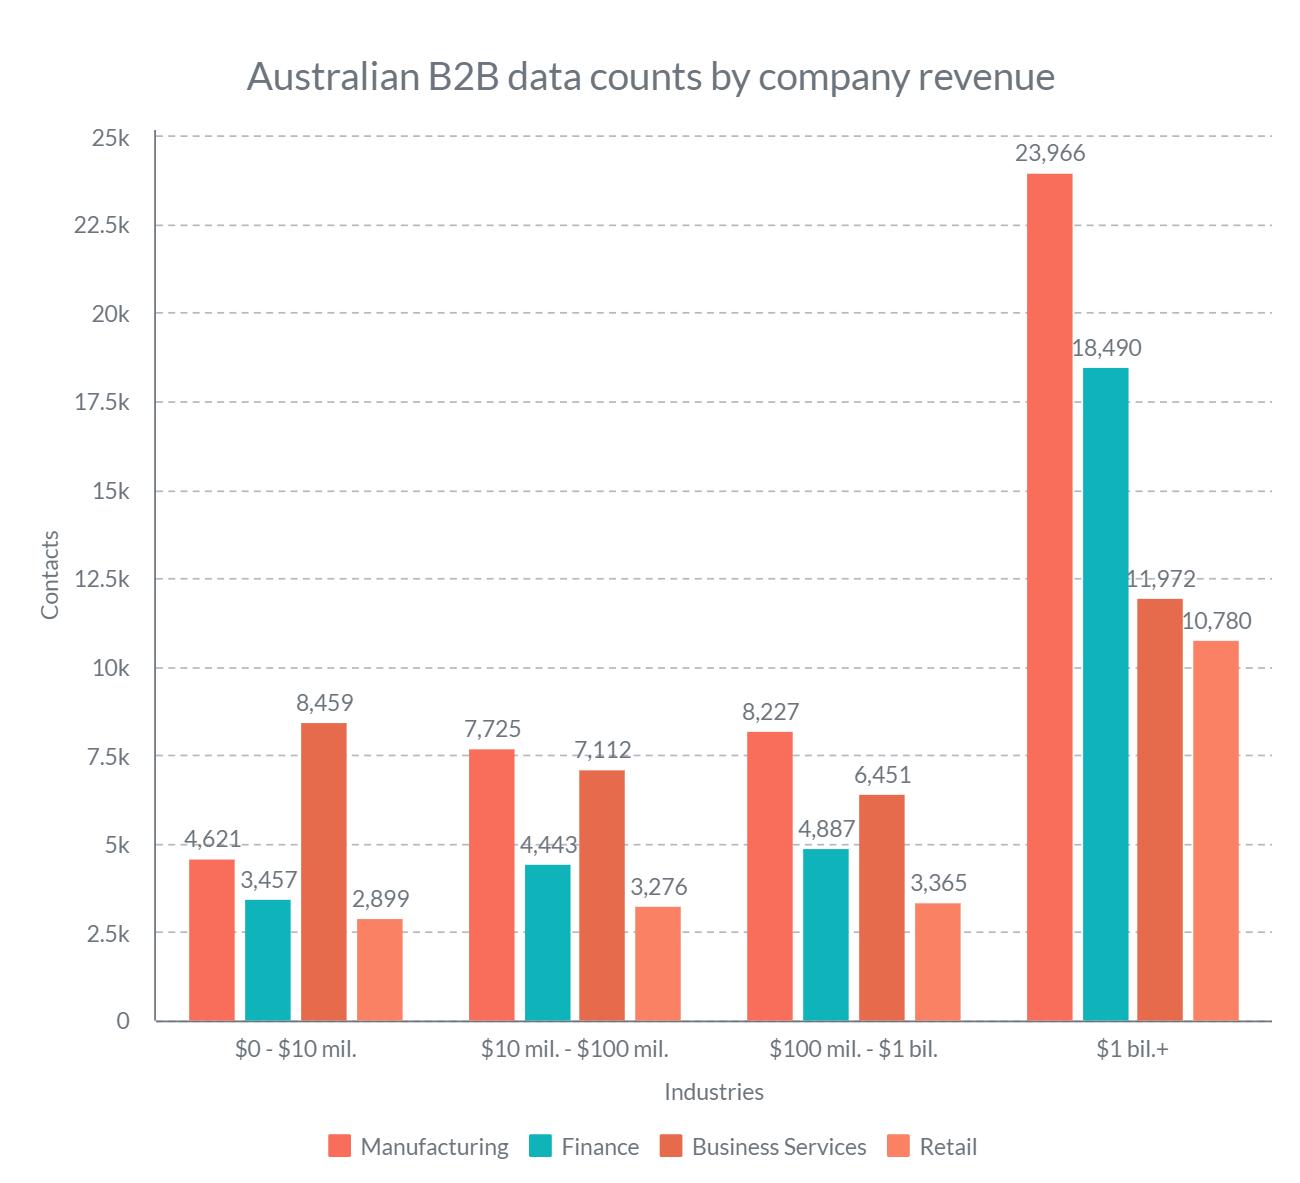 Australian b2b data counts by company revenue